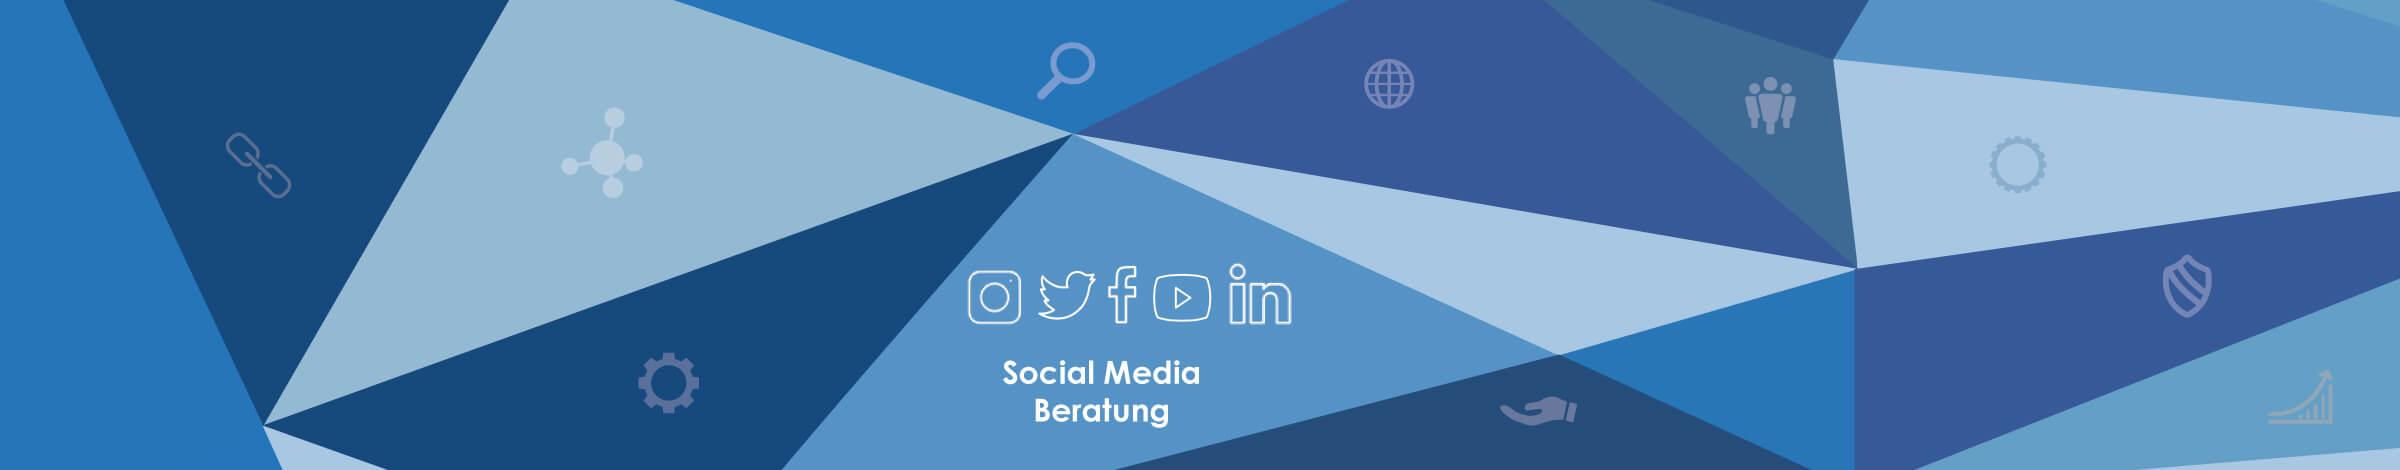 web updates kmu GmbH-wuk-WordPress und SEO Agentur -  Social-Media